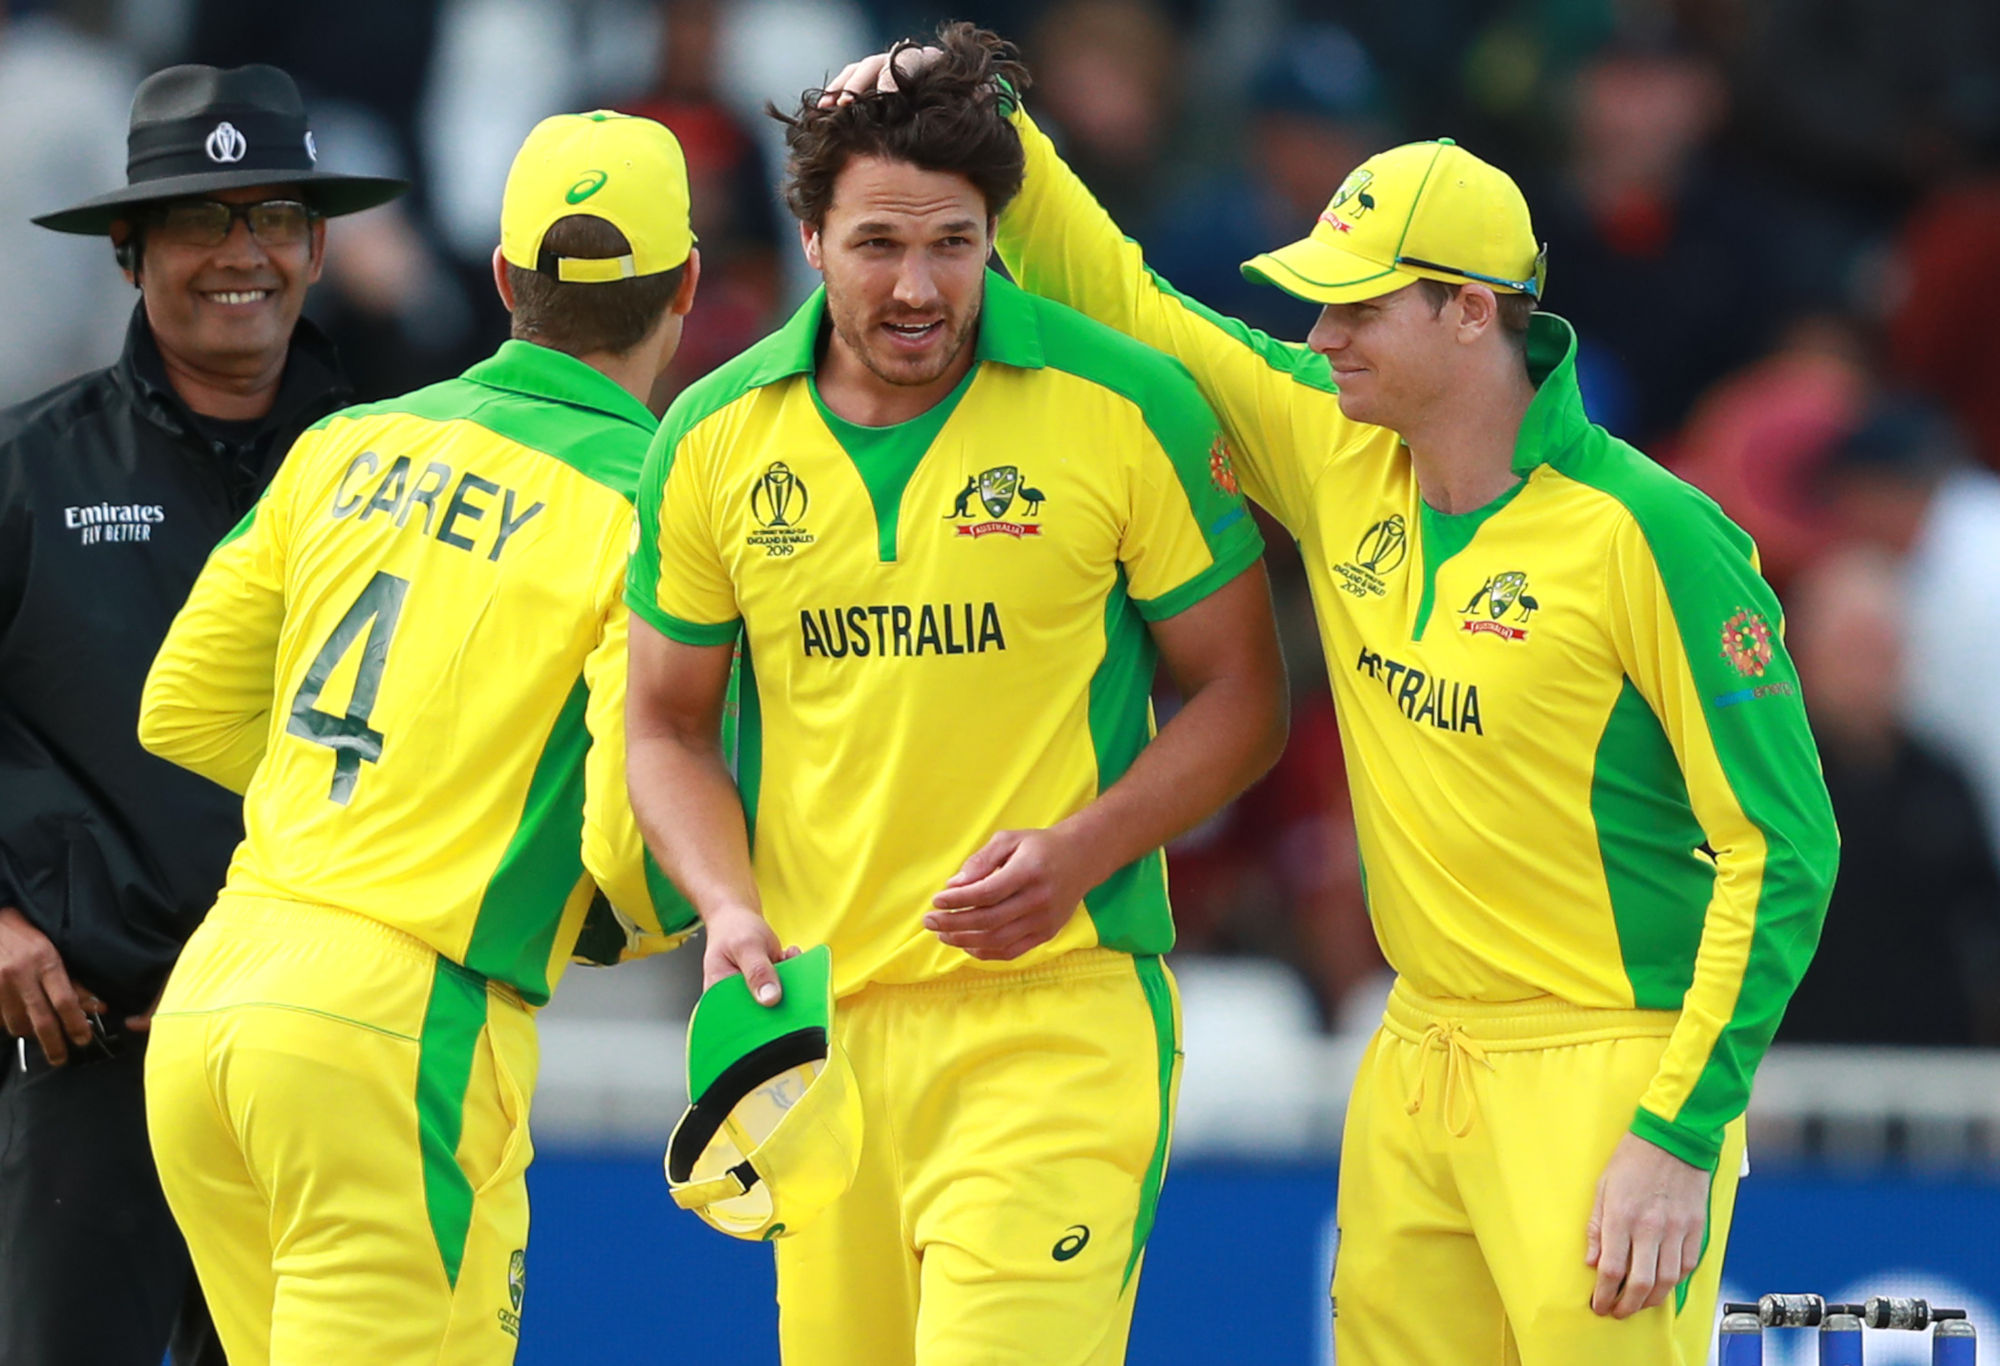 Australia vs Bangladesh: 2019 Cricket World Cup preview